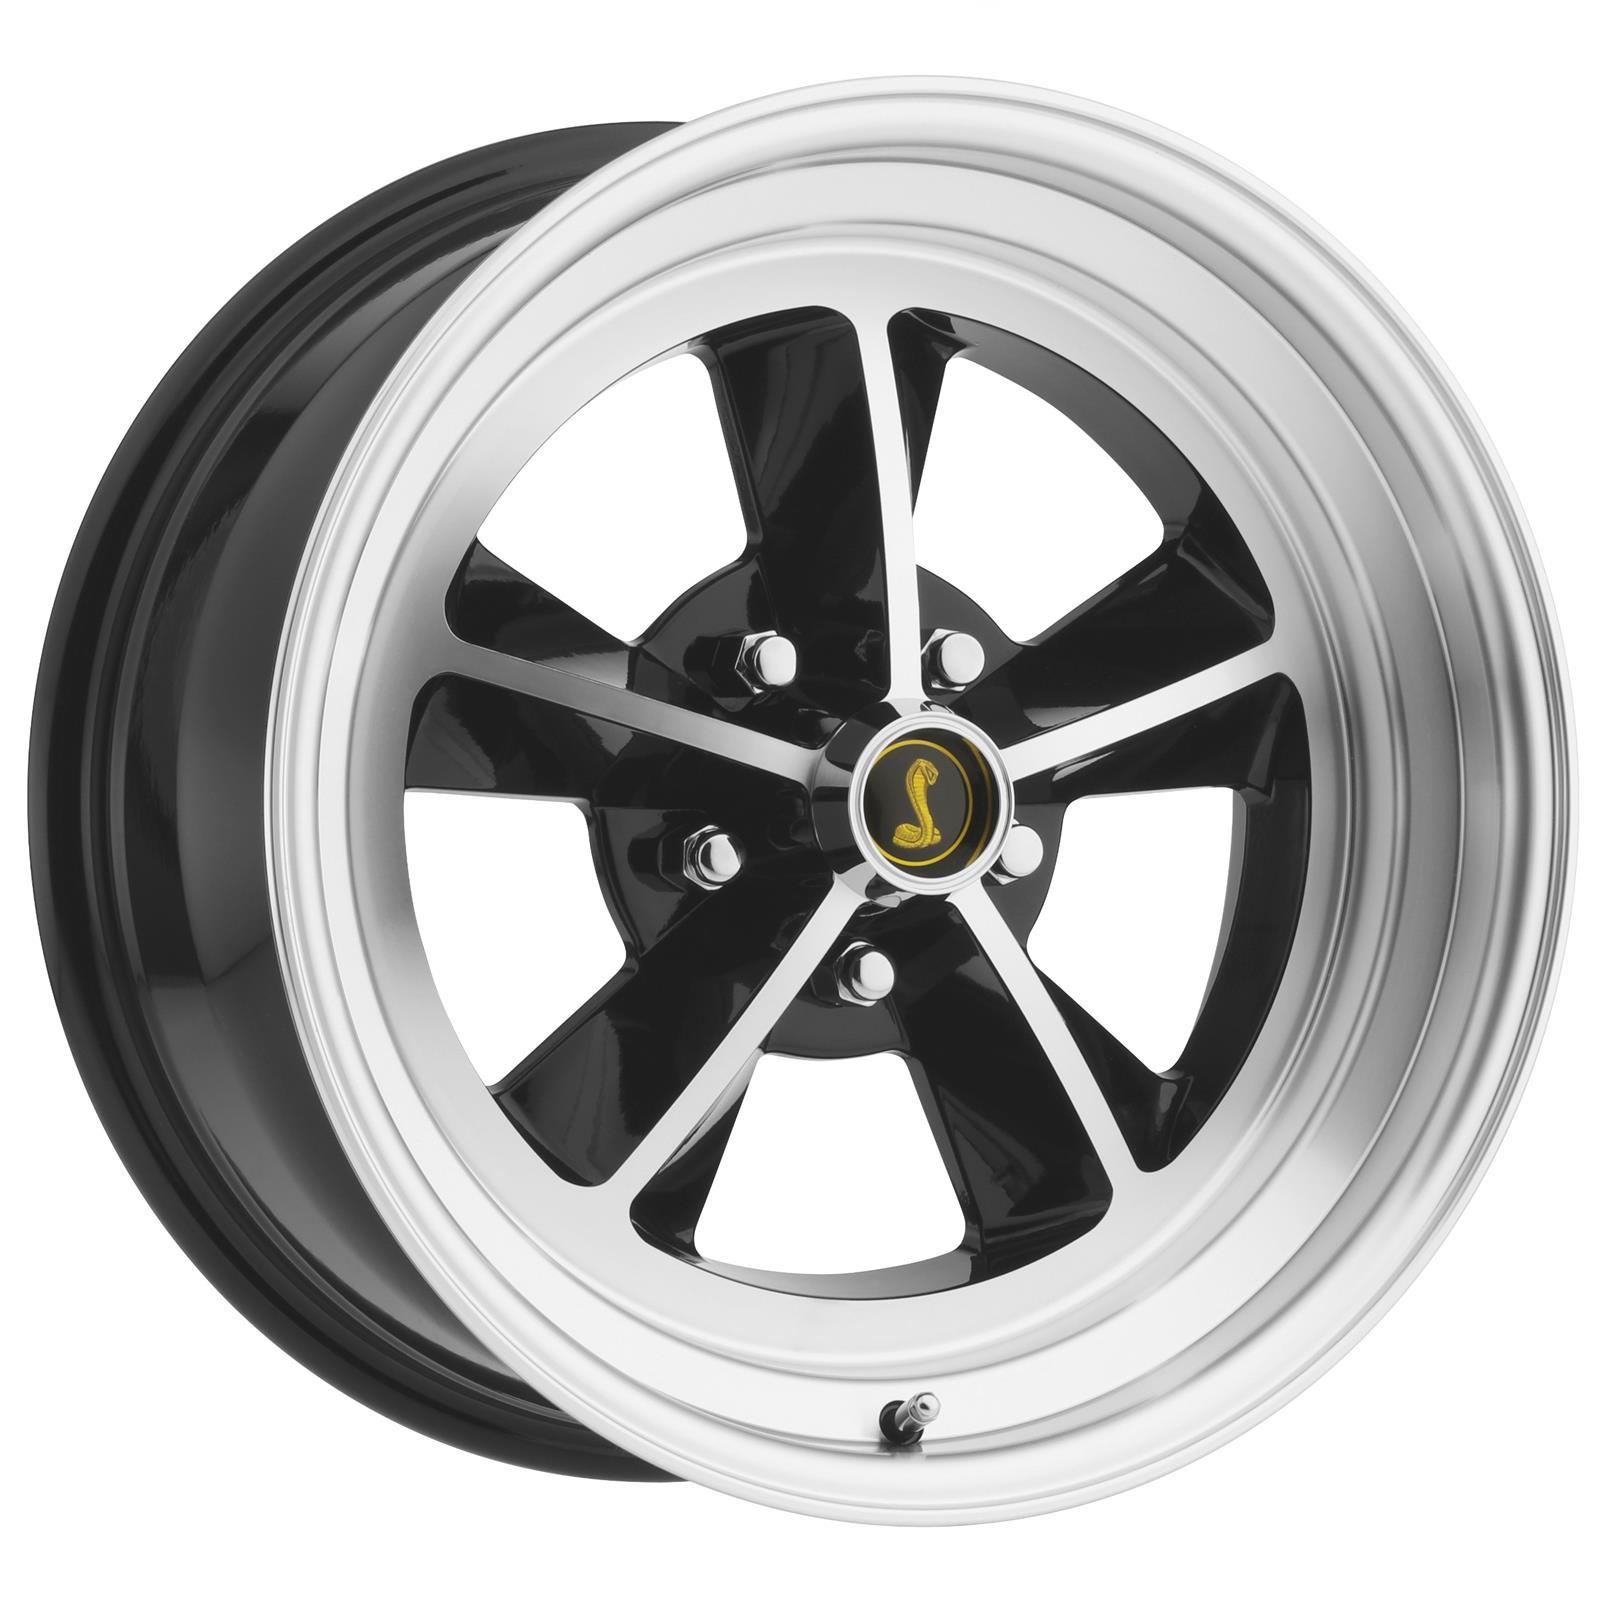 Scott Drake Legendary GT9 Alloy Machined Wheels With Black